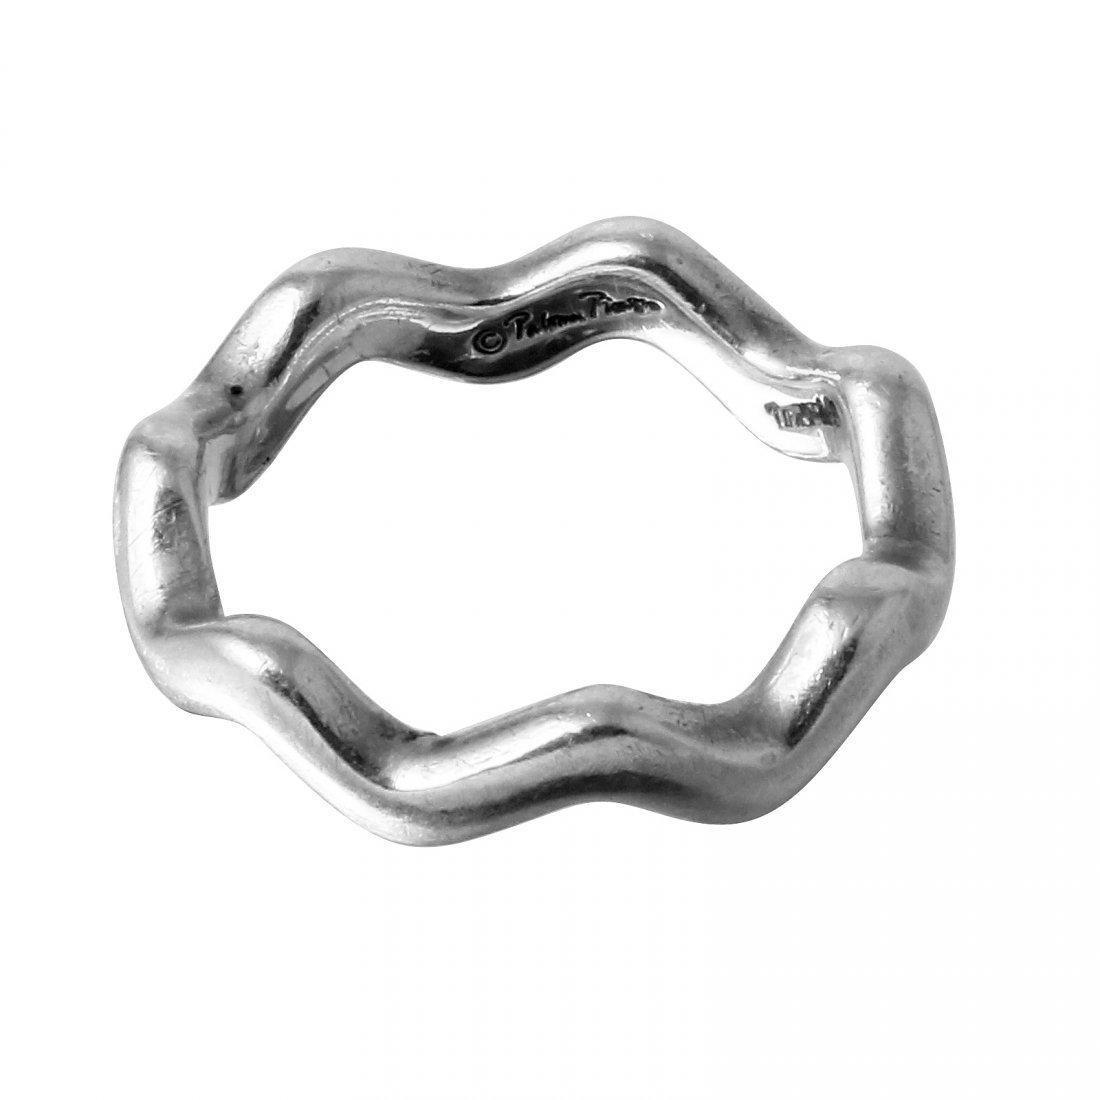 Tiffany & Co: Paloma Picasso Zig Zag Ring, Size 7.5 - 2